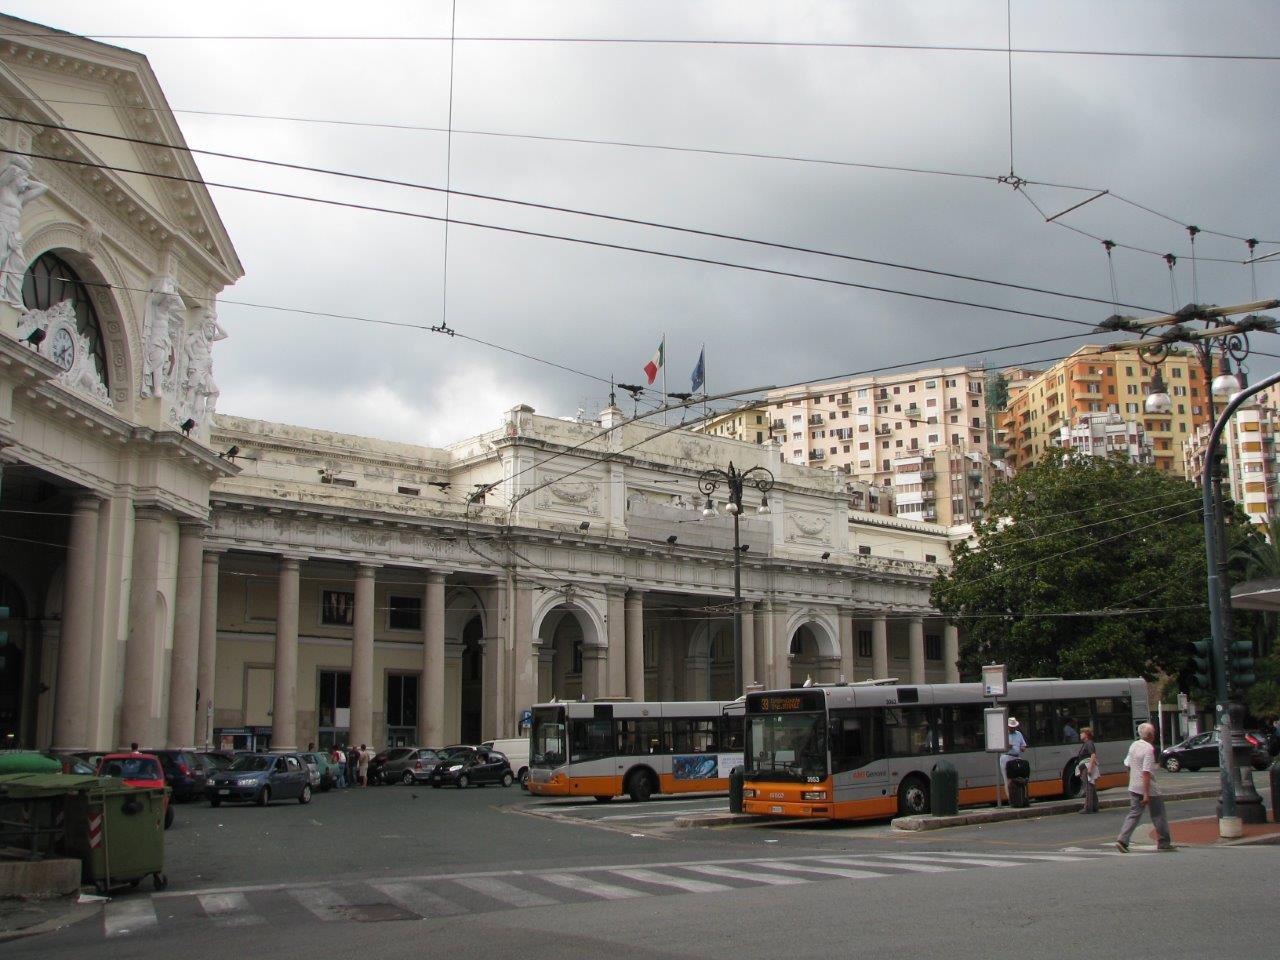 stazione-genova-piazza-principe-railway-station